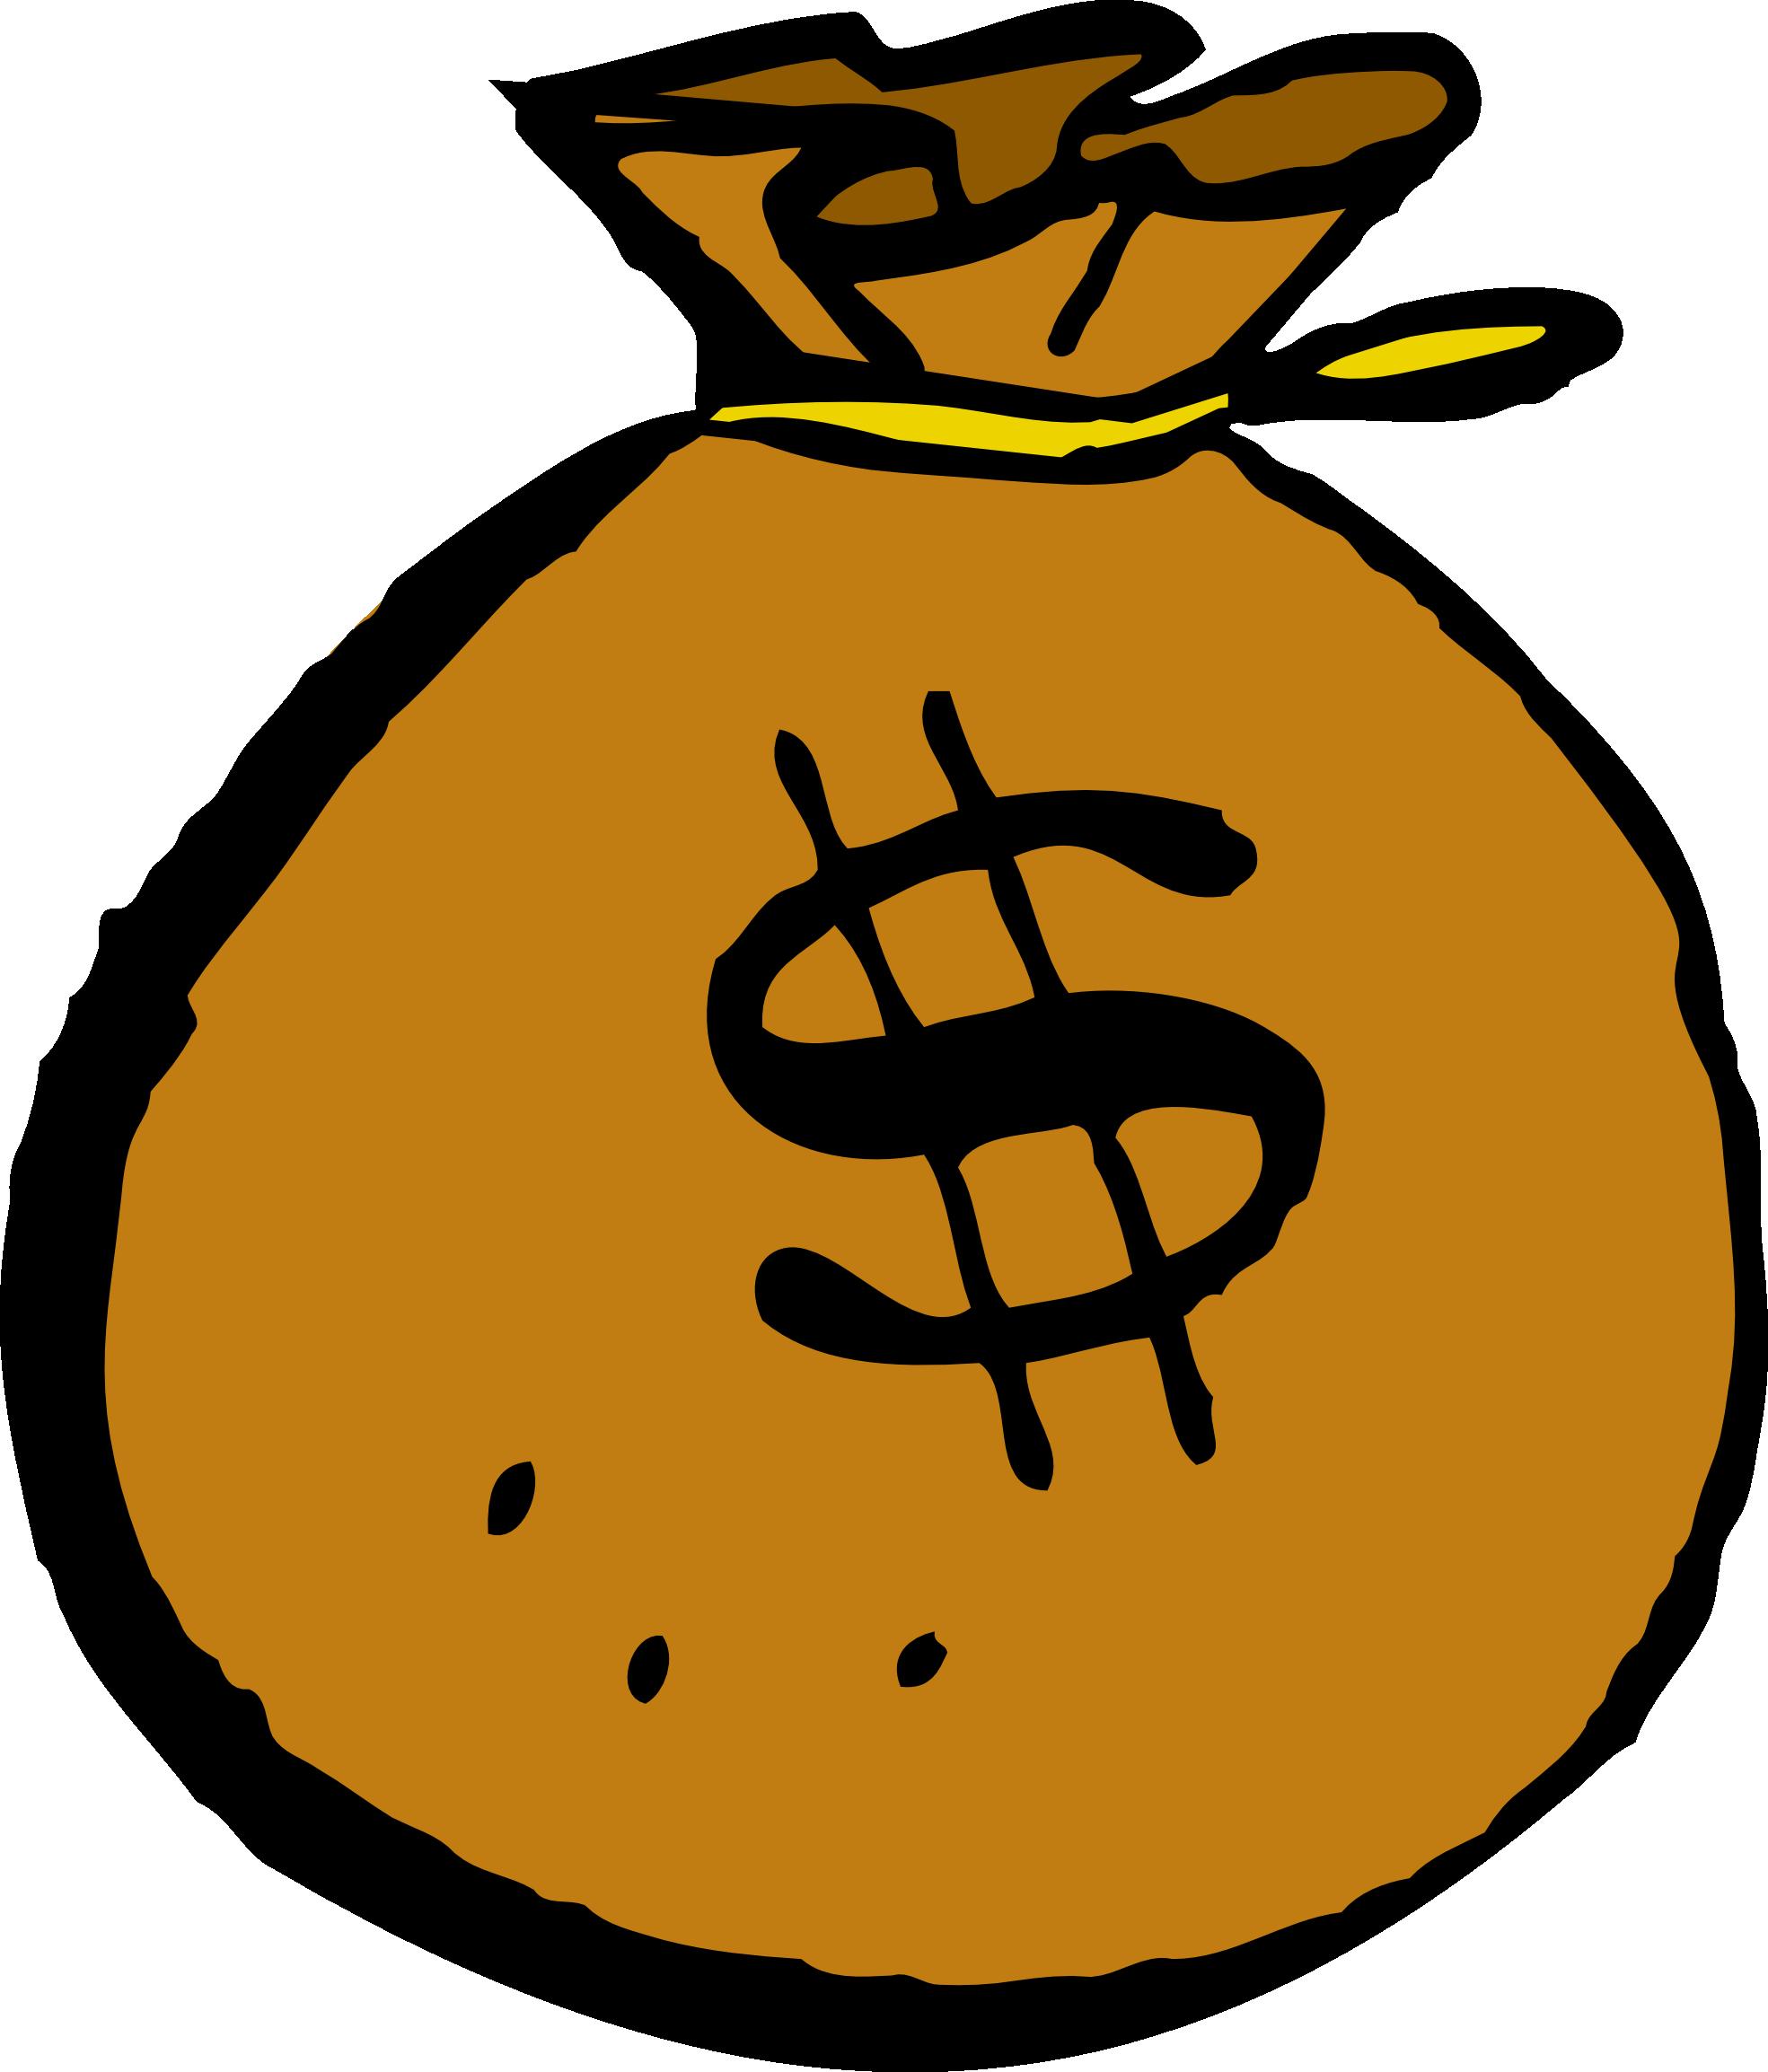 Wallet clipart orange bag. Money panda free images